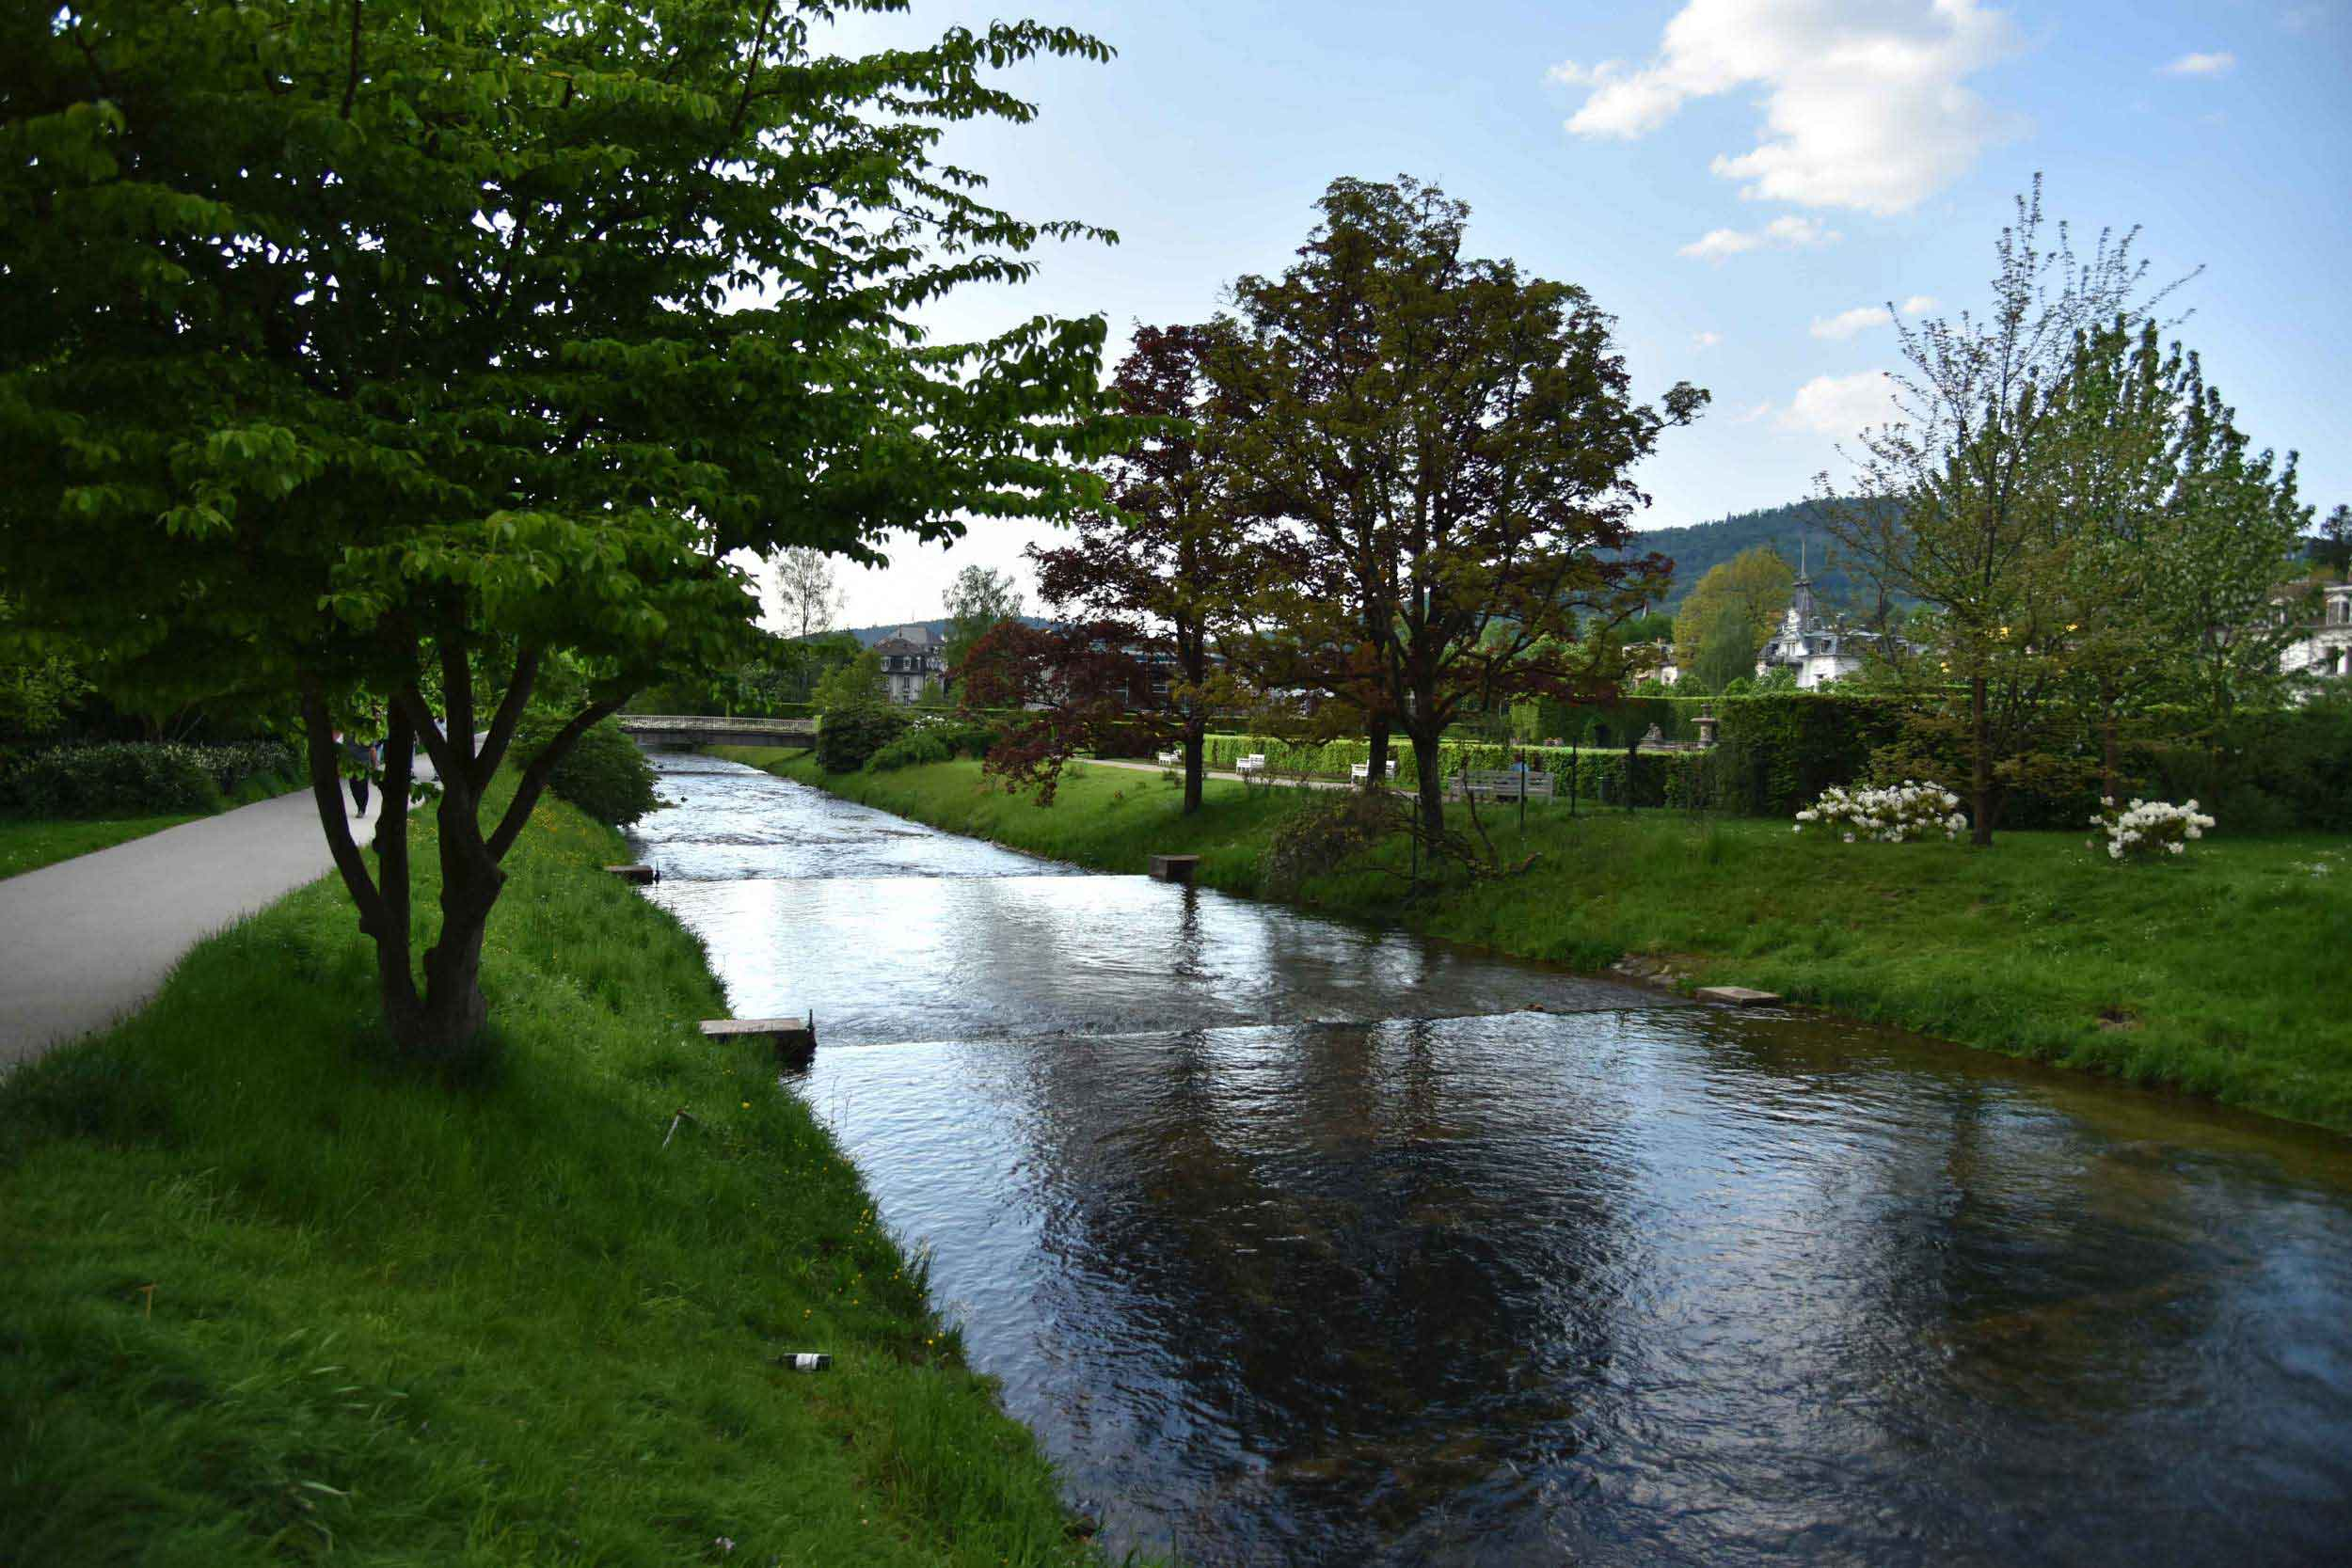 Oos river, Lichtentaler Allee, Baden Baden, Germany. Image©thingstodot.com